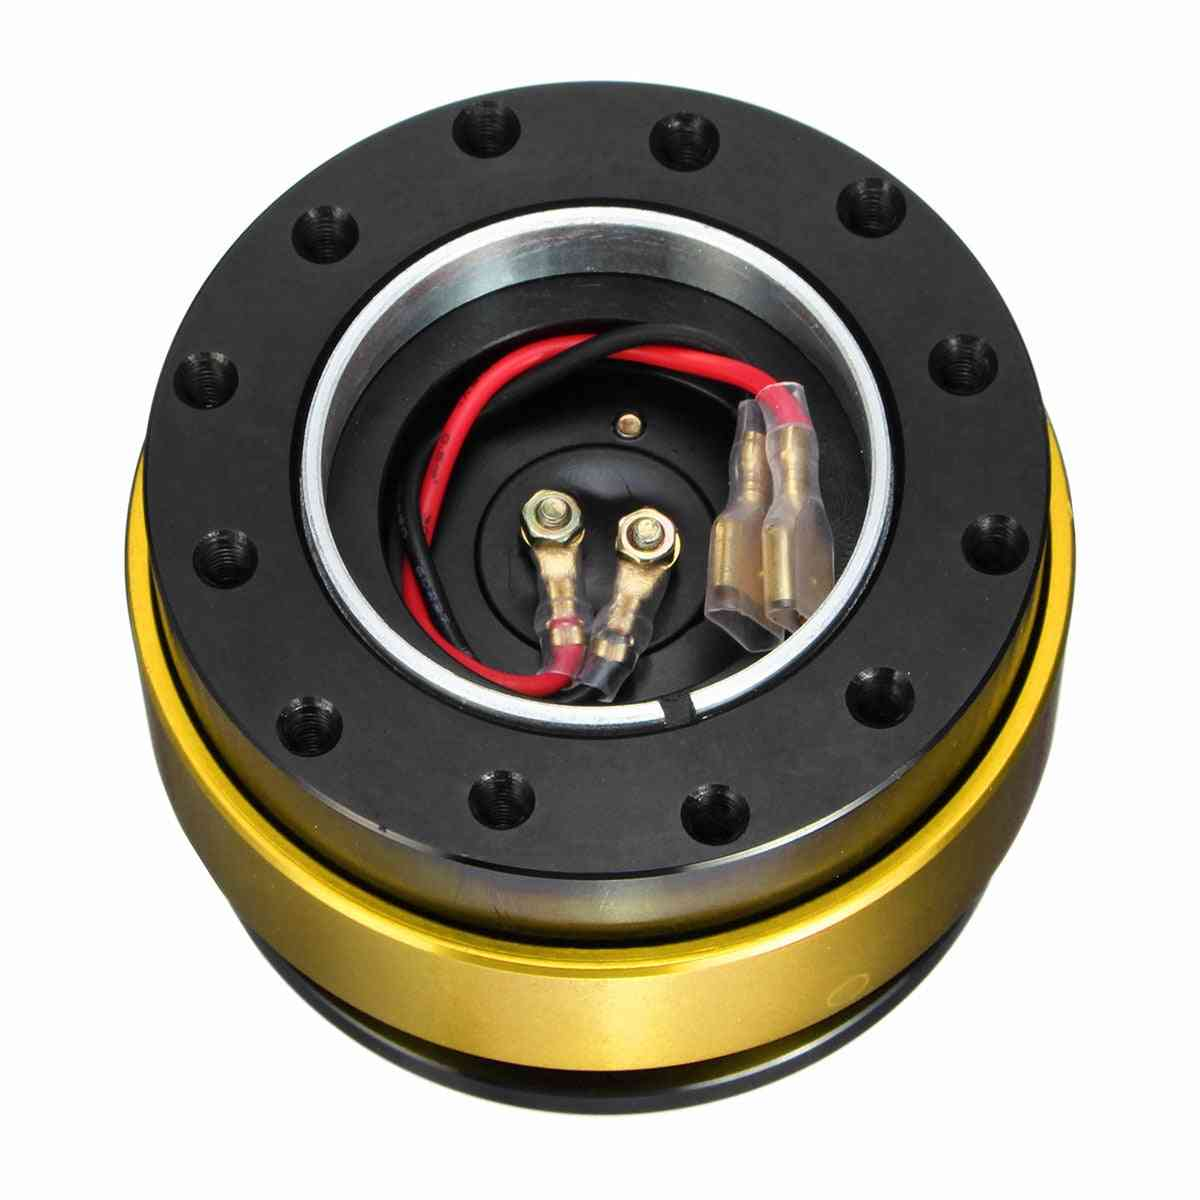 Universal Car Auto Quick Release Steering Wheel Snap Off Hub Adapter Boss Kit Aluminum